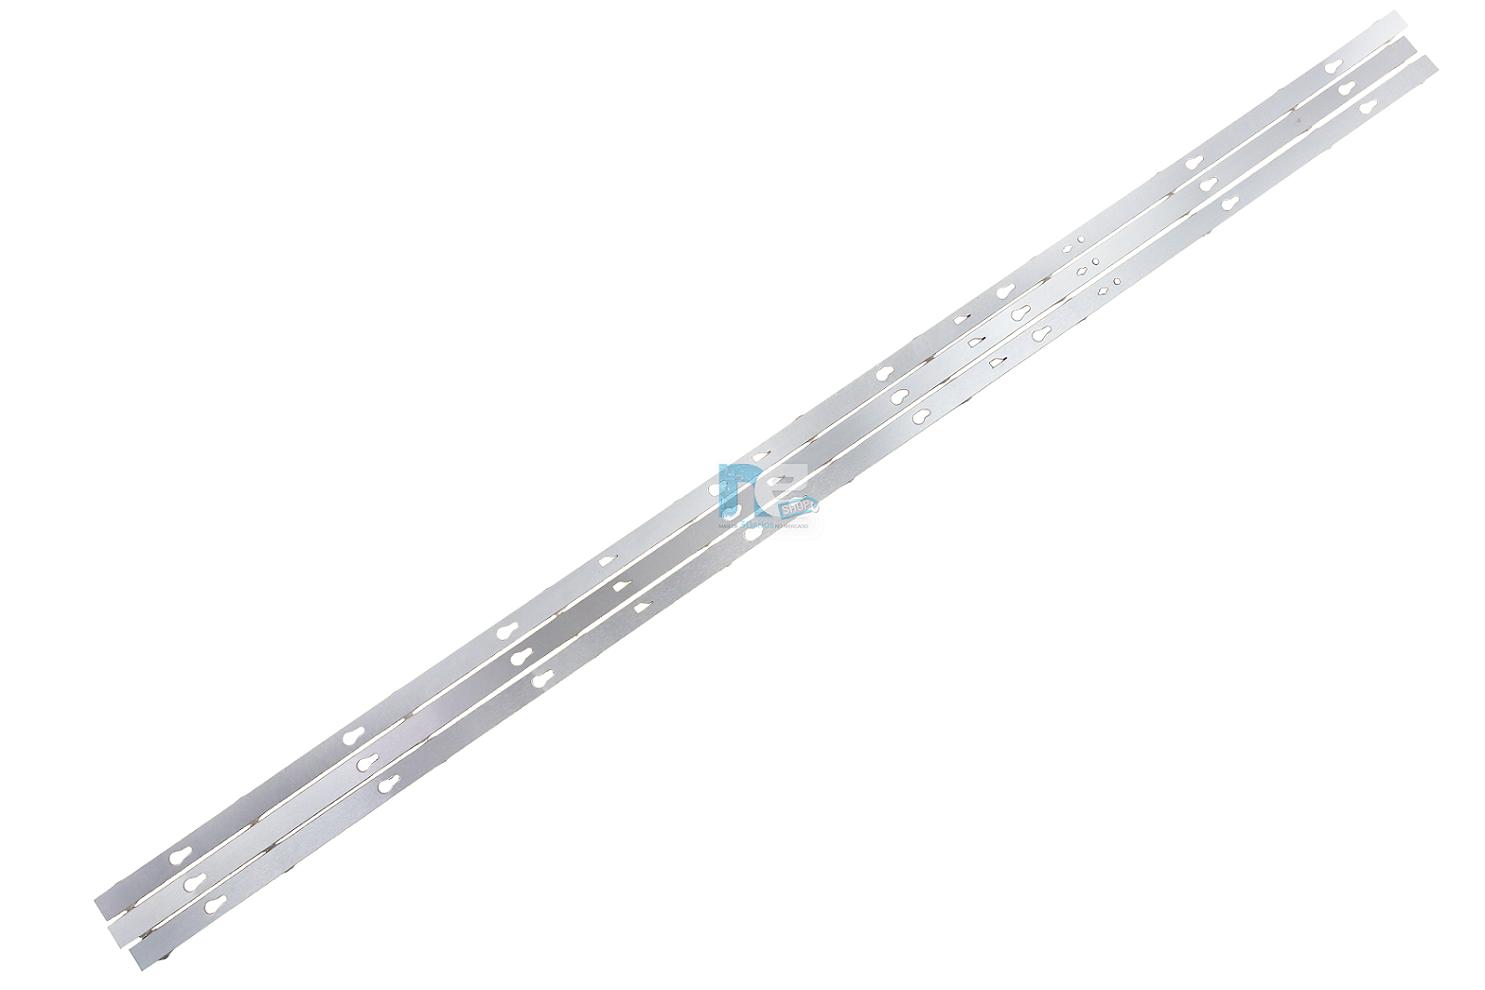 KIT BARRA DE LED TOSHIBA TCL 49SK6000 49HR332M11A2